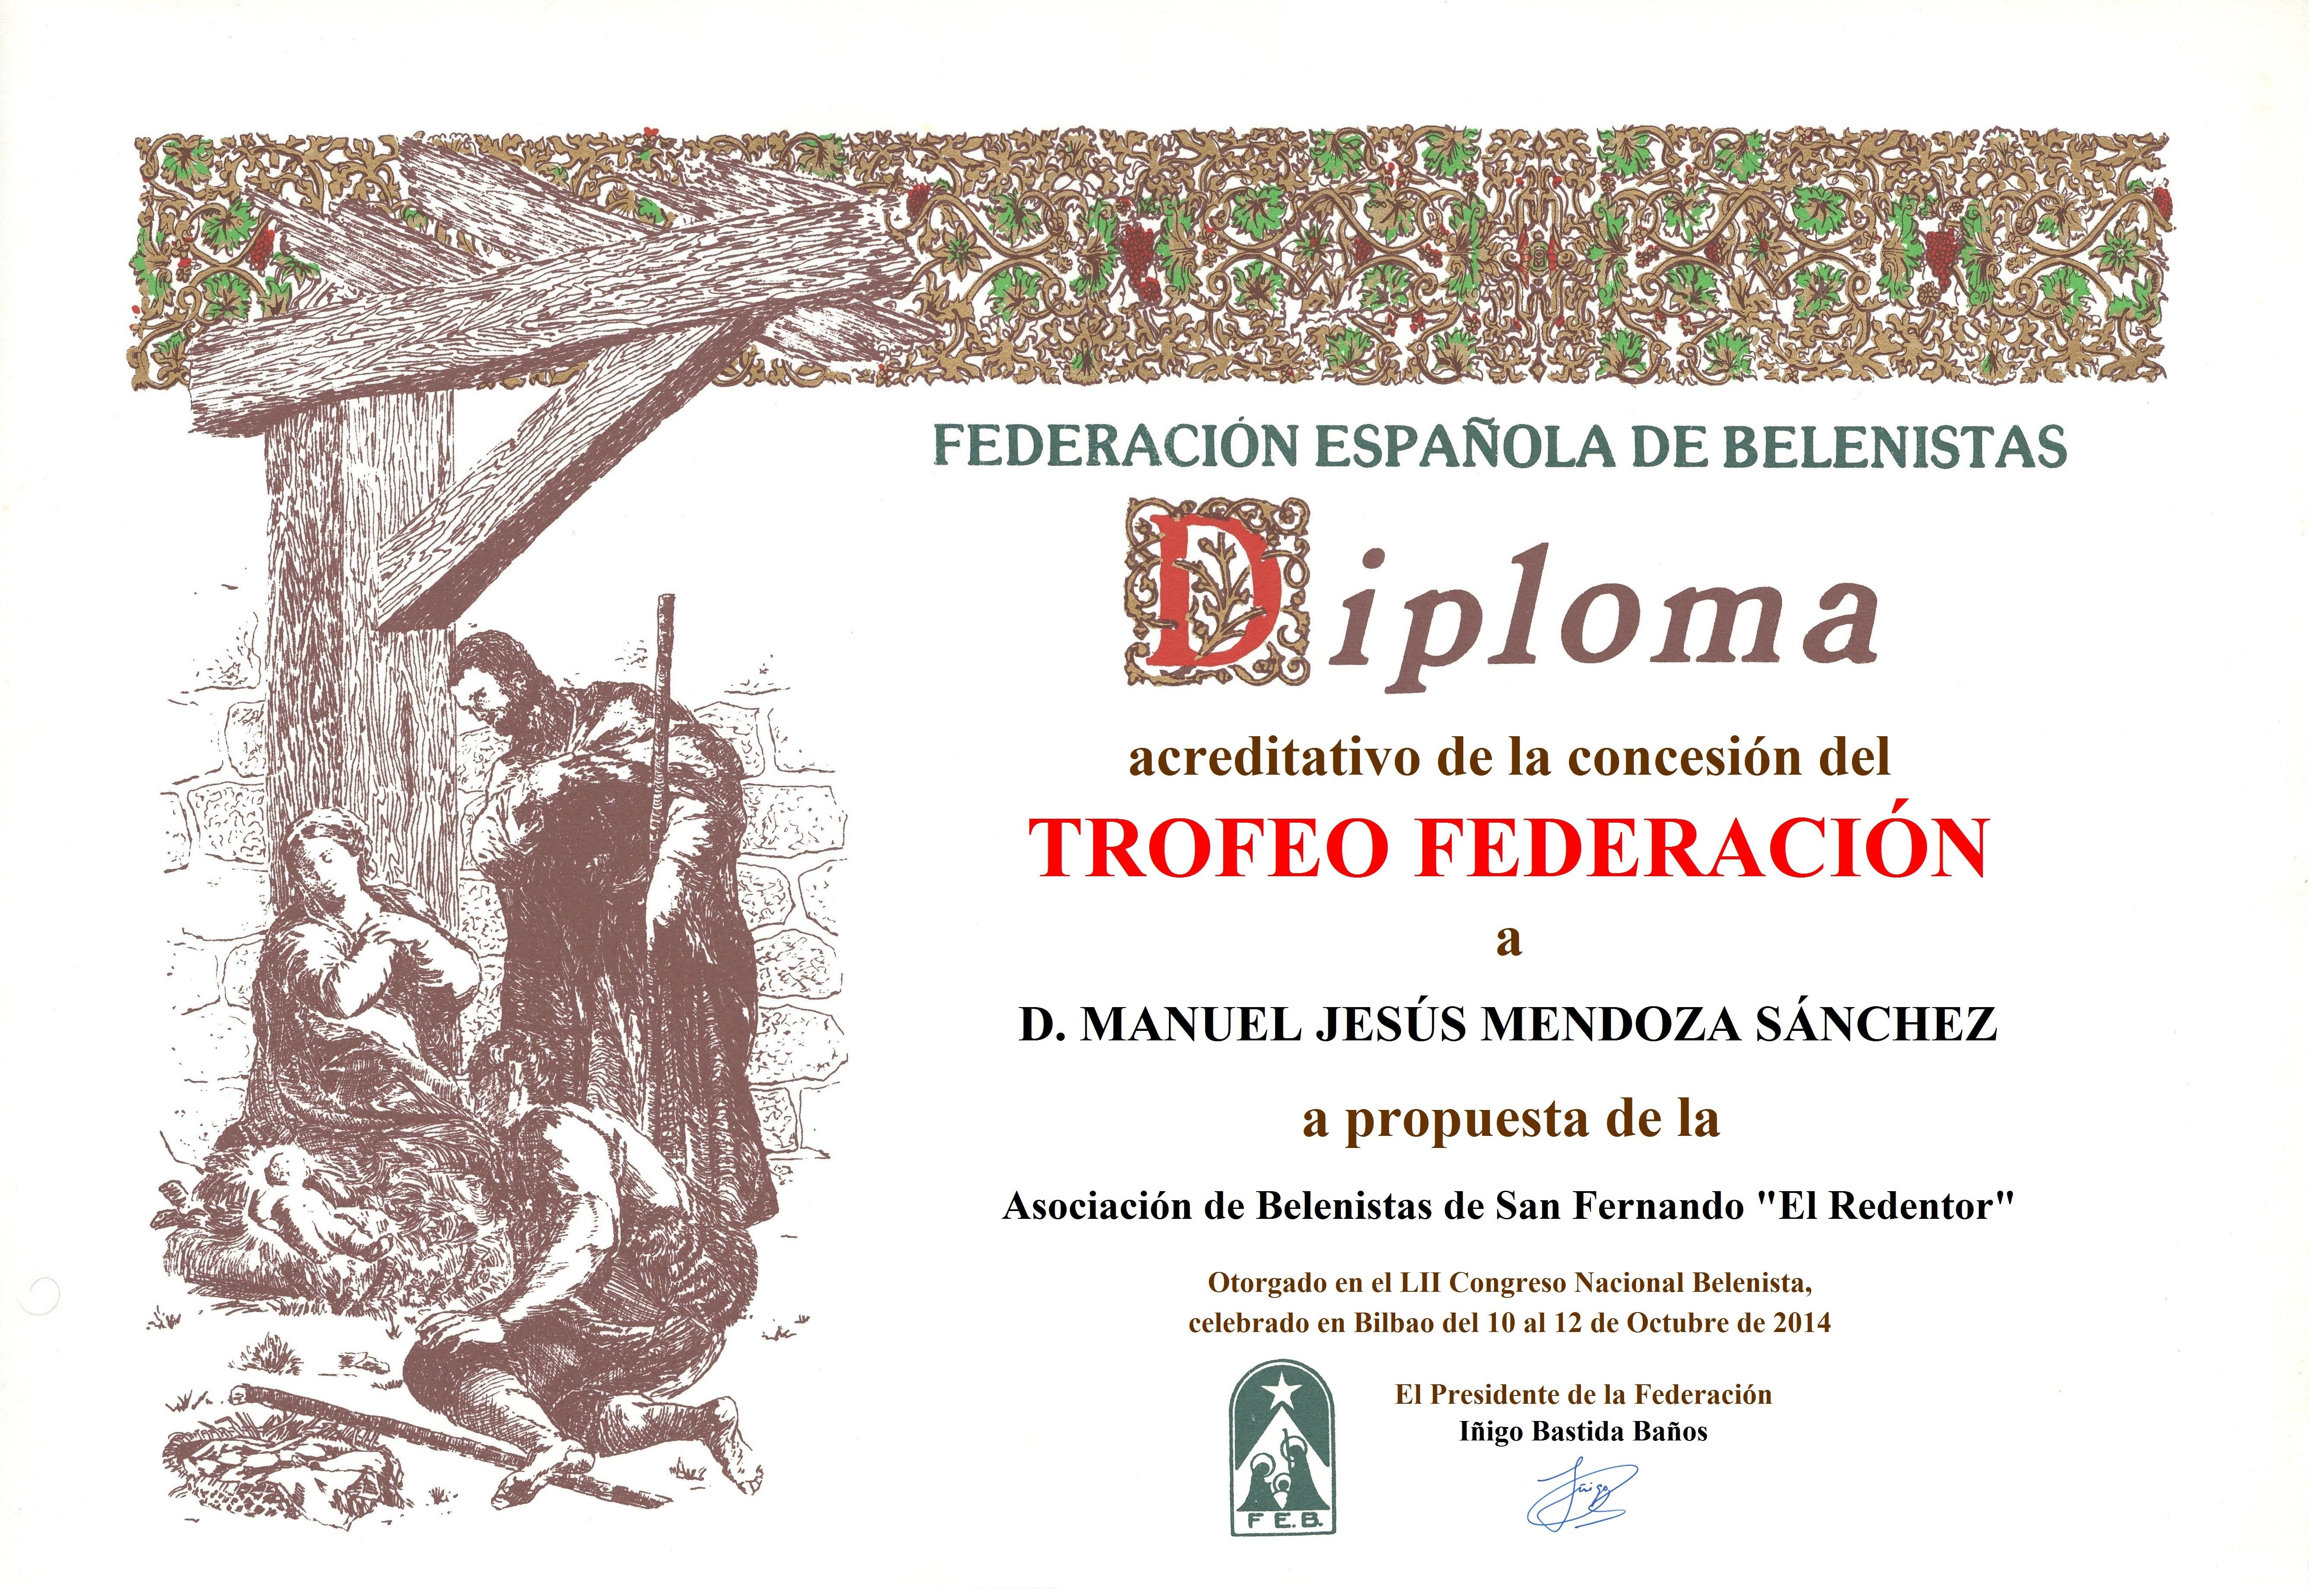 Diploma Trofeo FEB 2014 Manuel Jesús Mendoza Sánchez